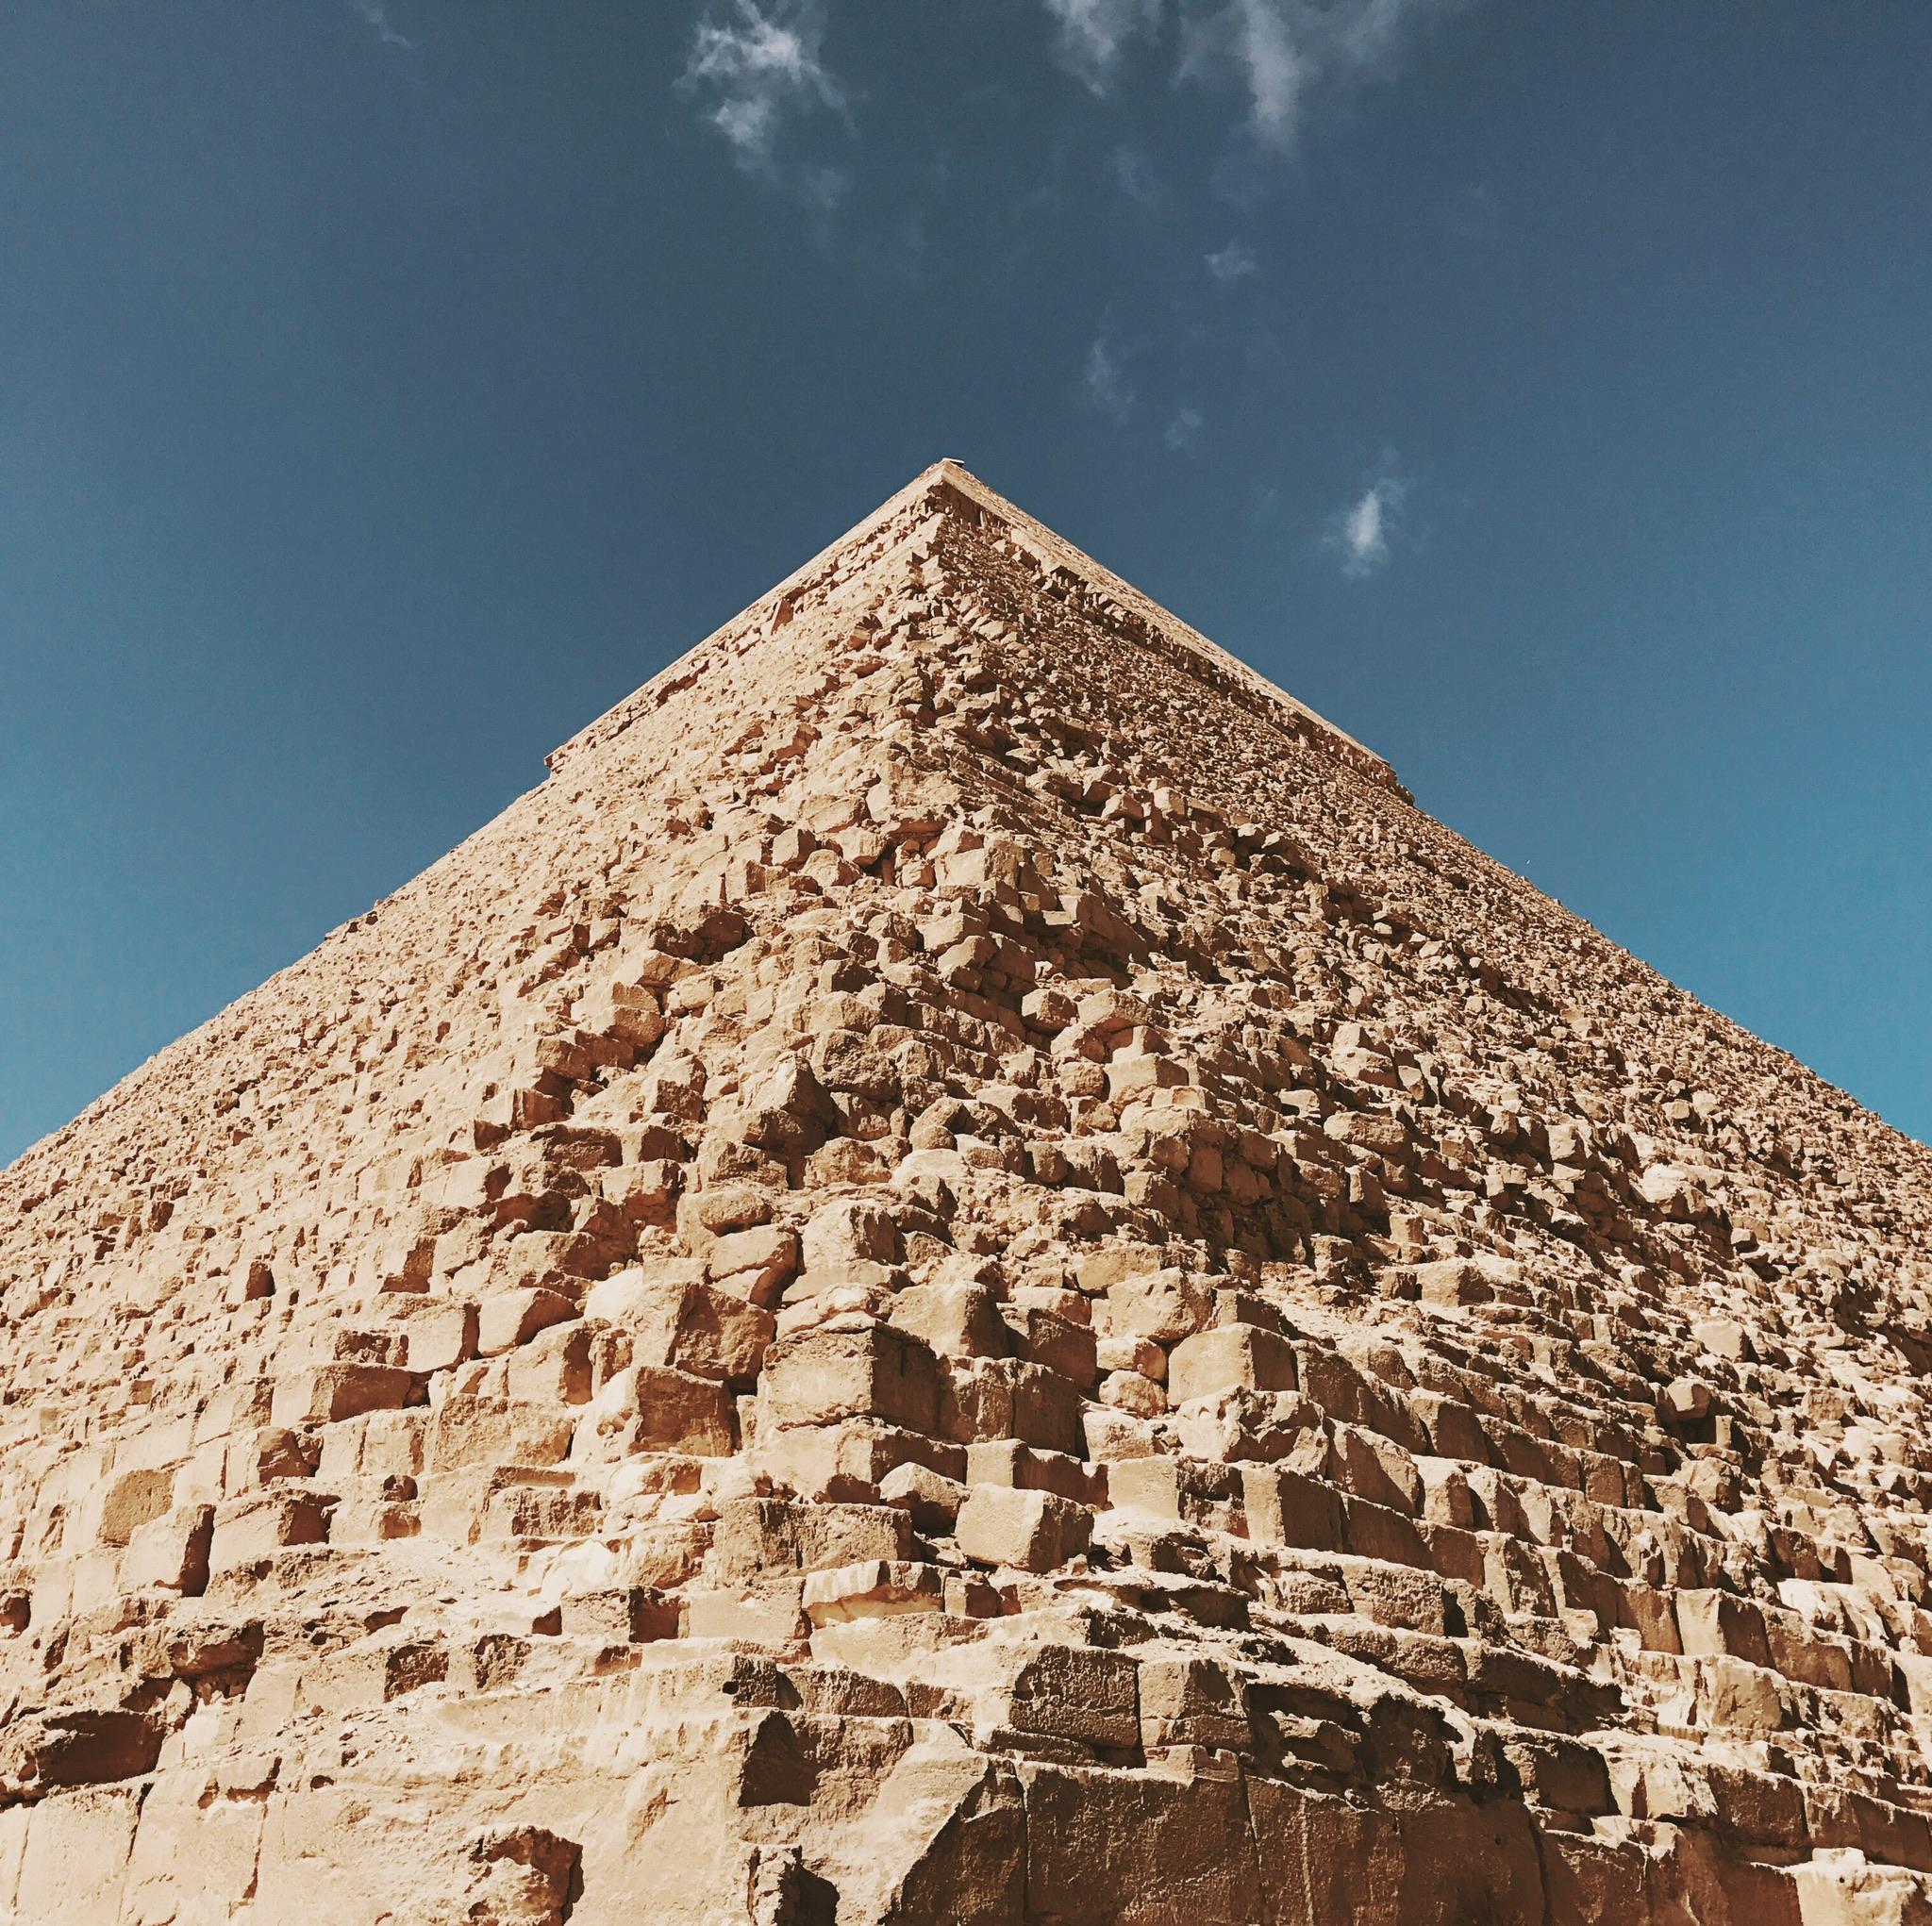 cairo, egypt   the great pyramids of giza